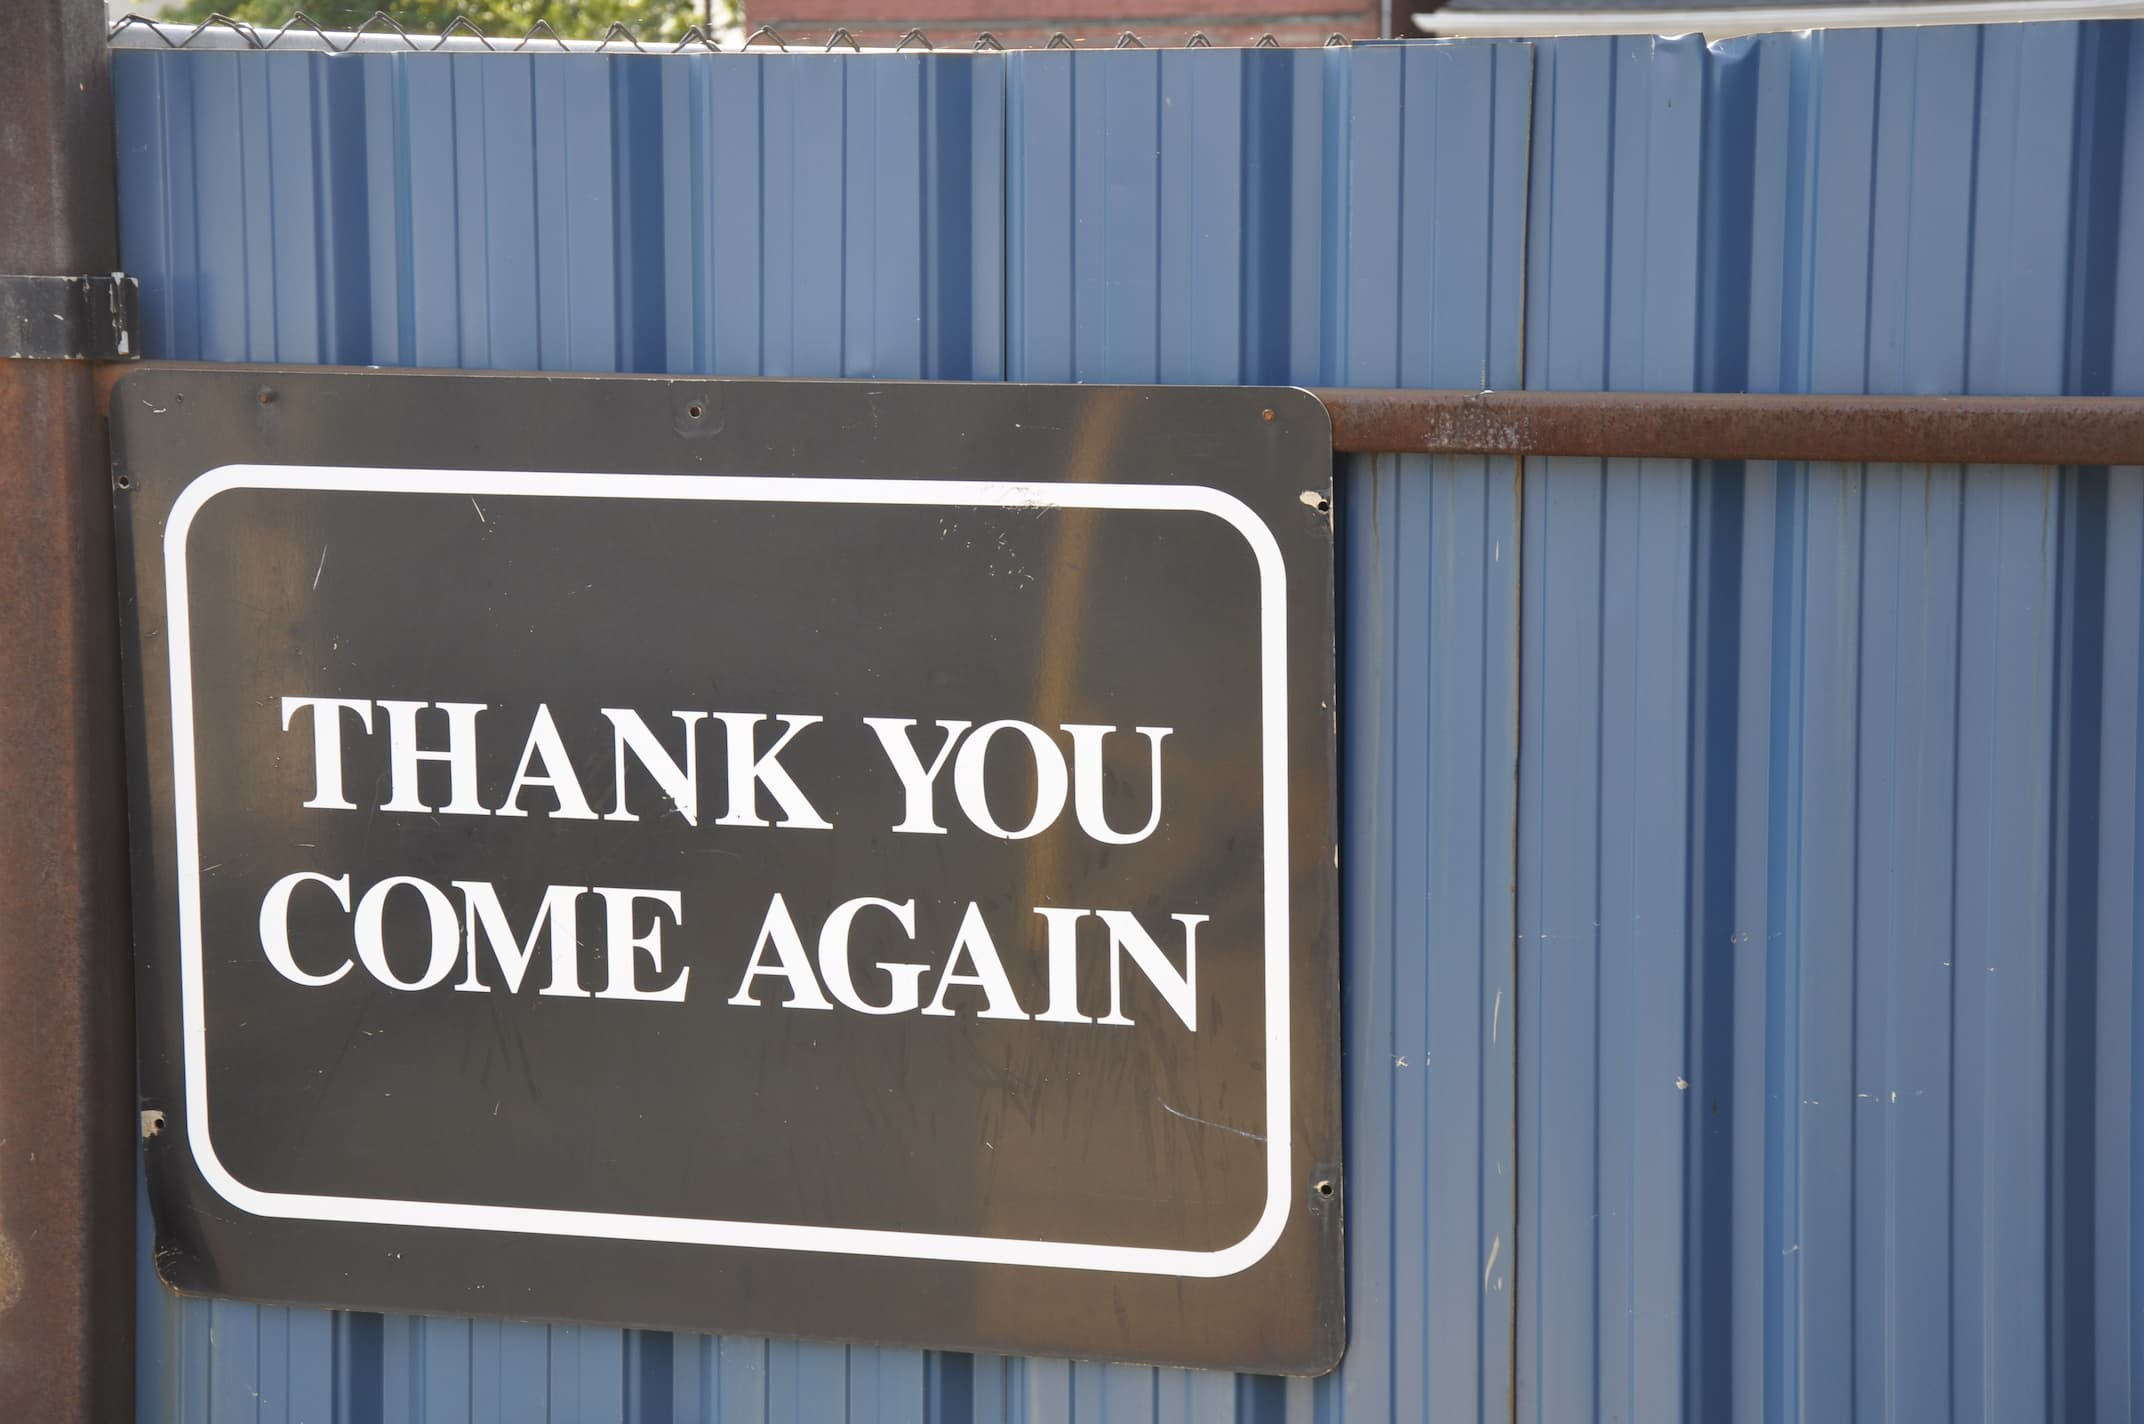 Scrap_Metal_Recycling_Yard_Come_again_sign_Wentworth Metal Recycling_495 Wentworth-St-N- Hamilton-ON